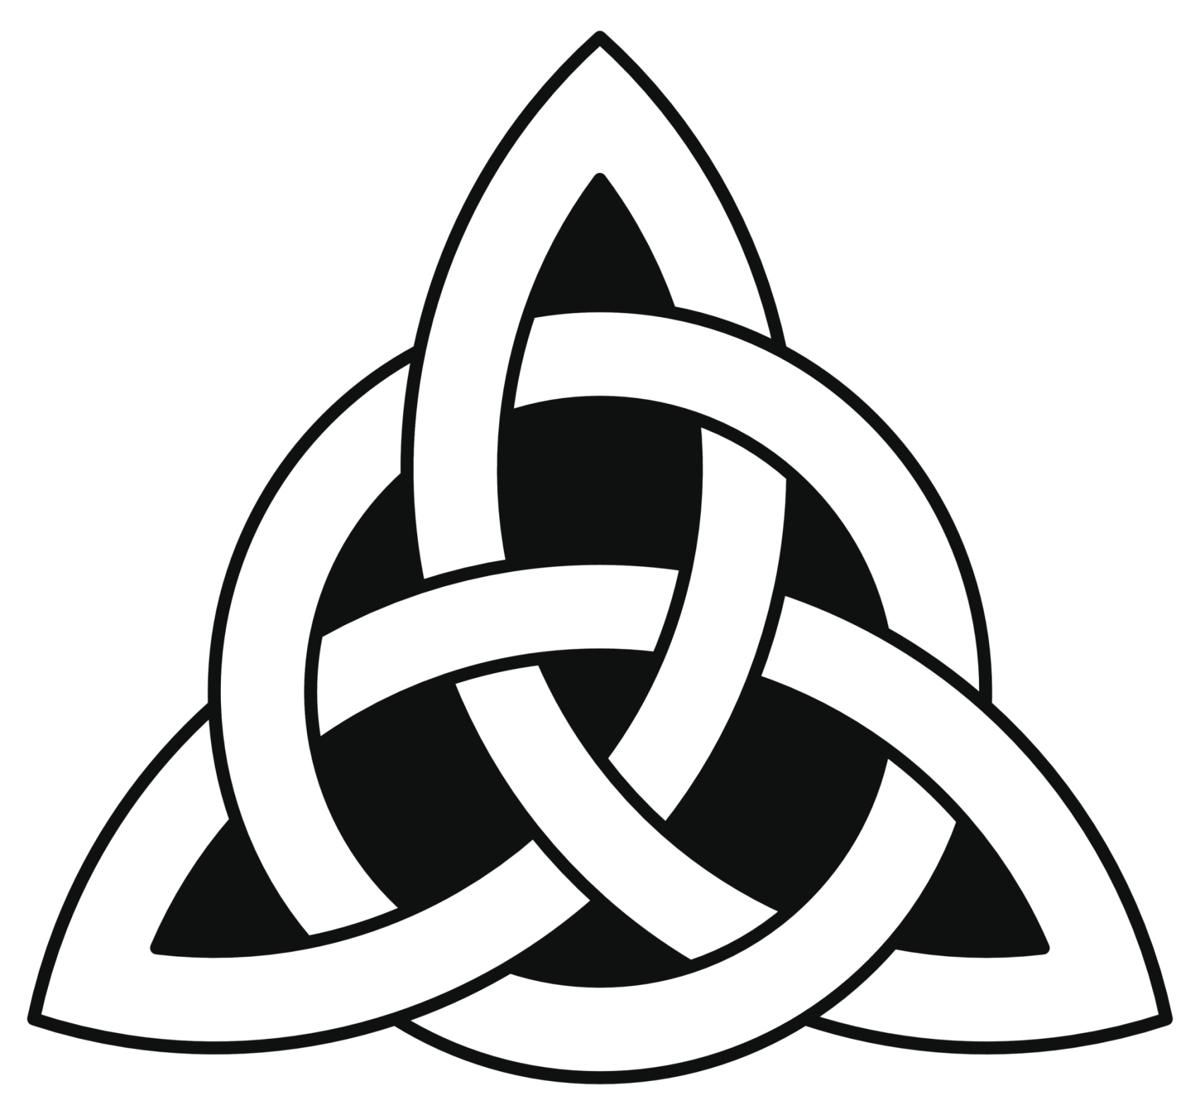 Irish symbols and meanings